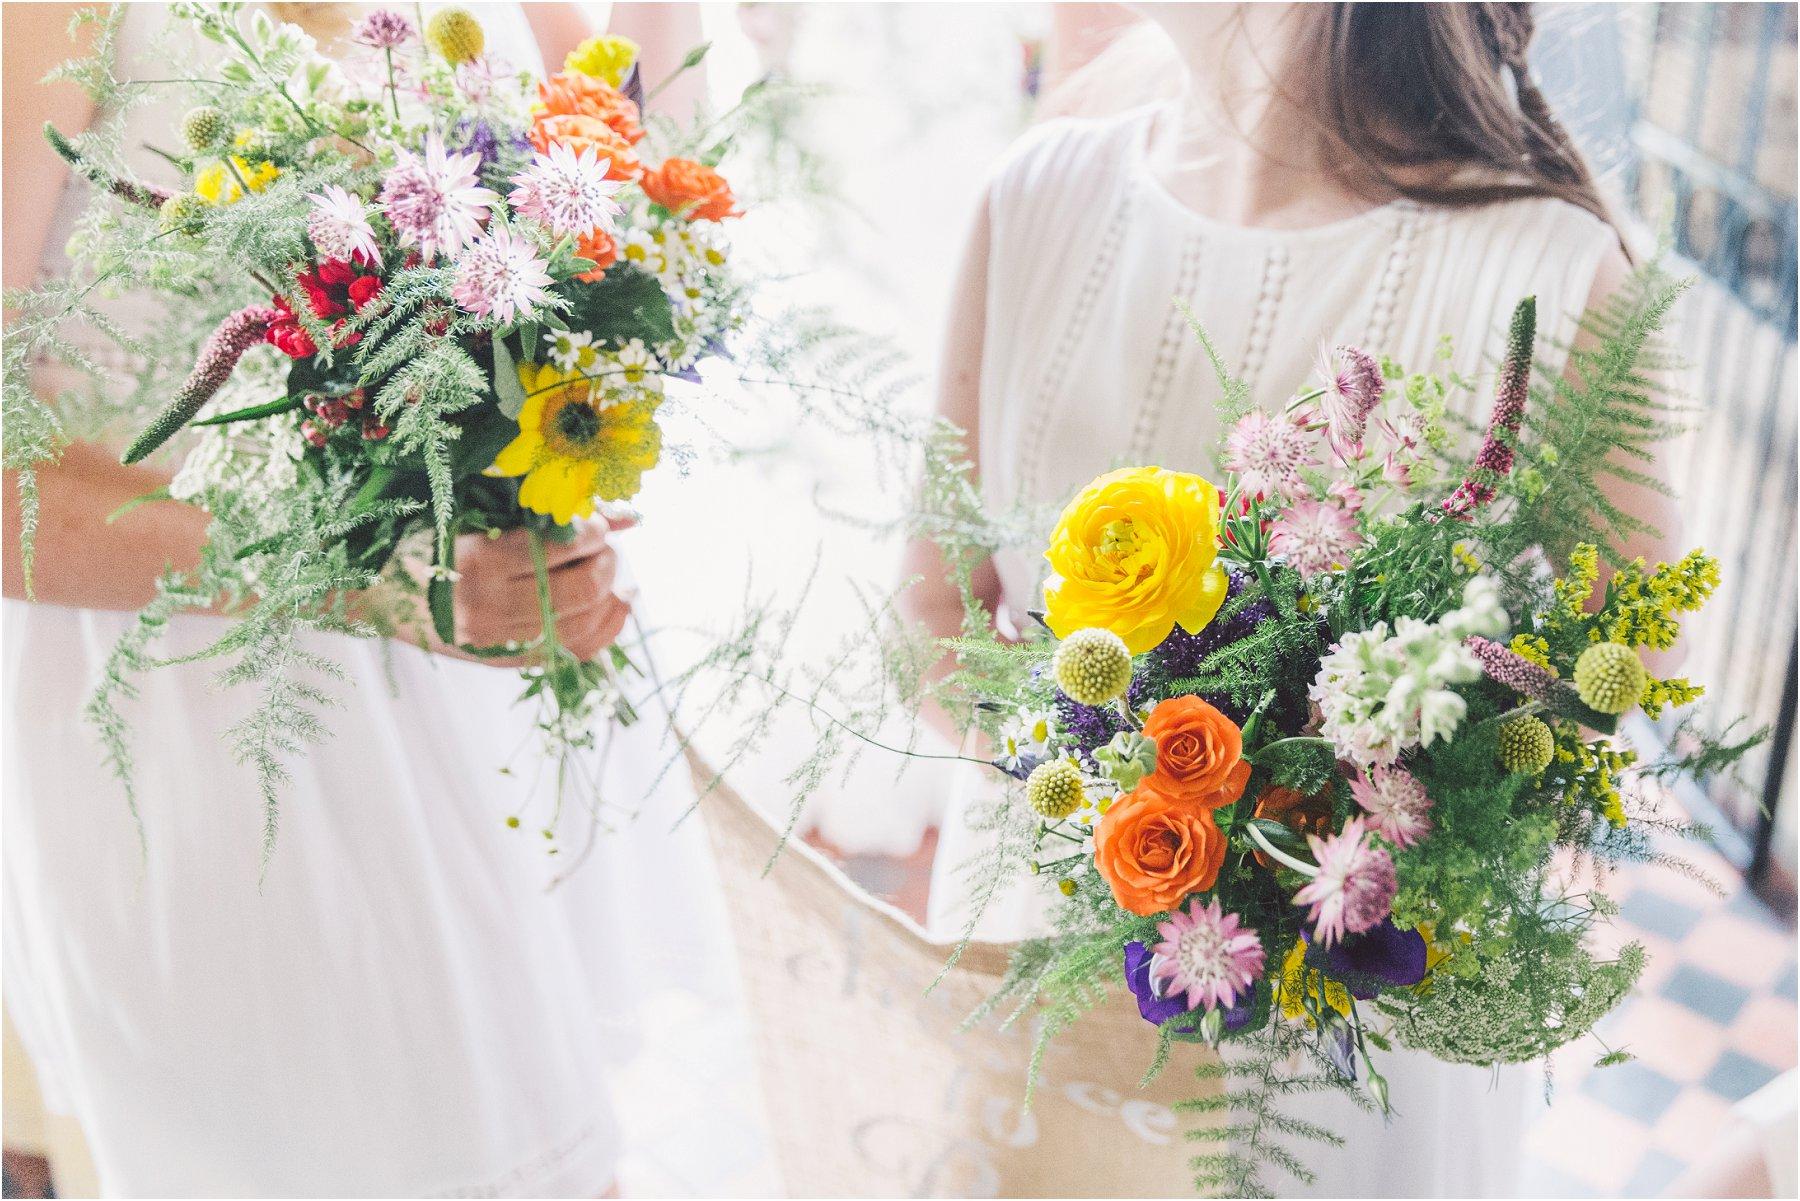 eve.photography.relaxed.creative.wedding.destination._0262.jpg